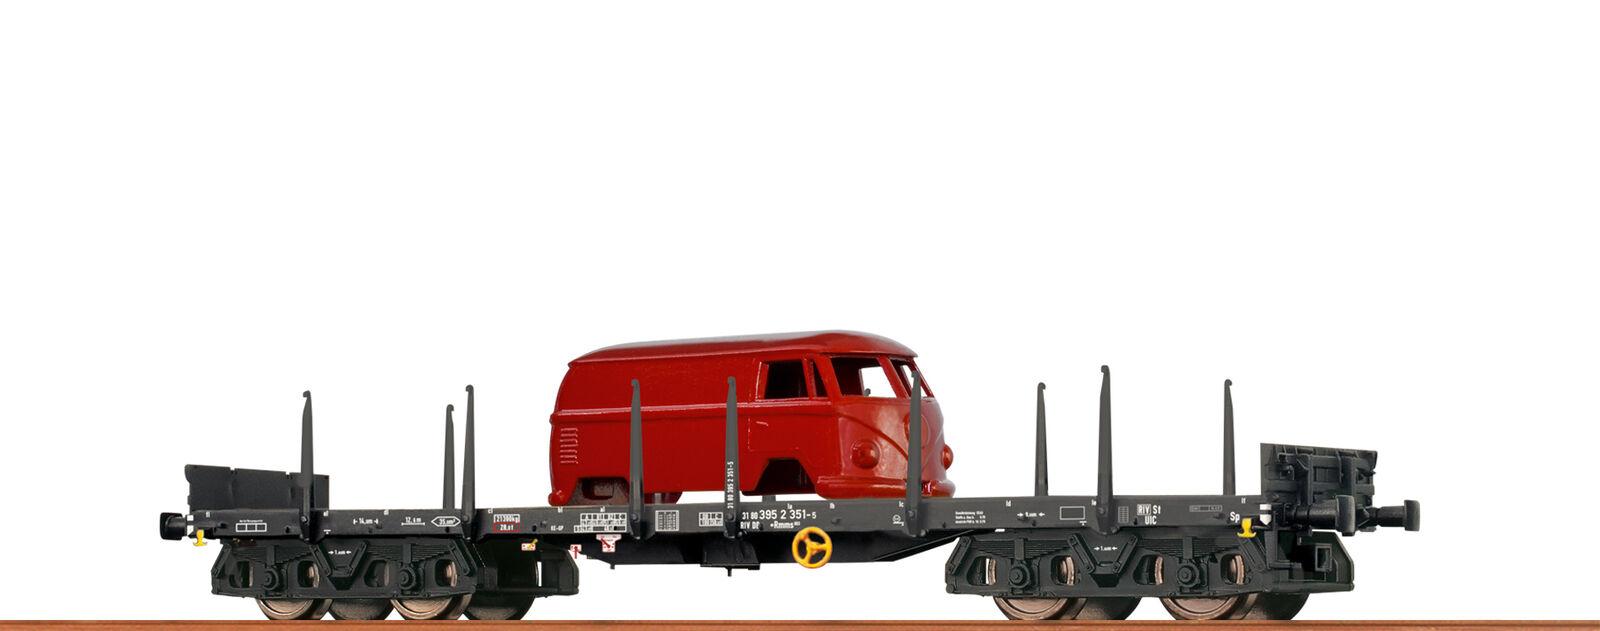 Brawa 47117 Échelle H0 Wagon Plat Rmms 663 Db, IV, Bogie Dc